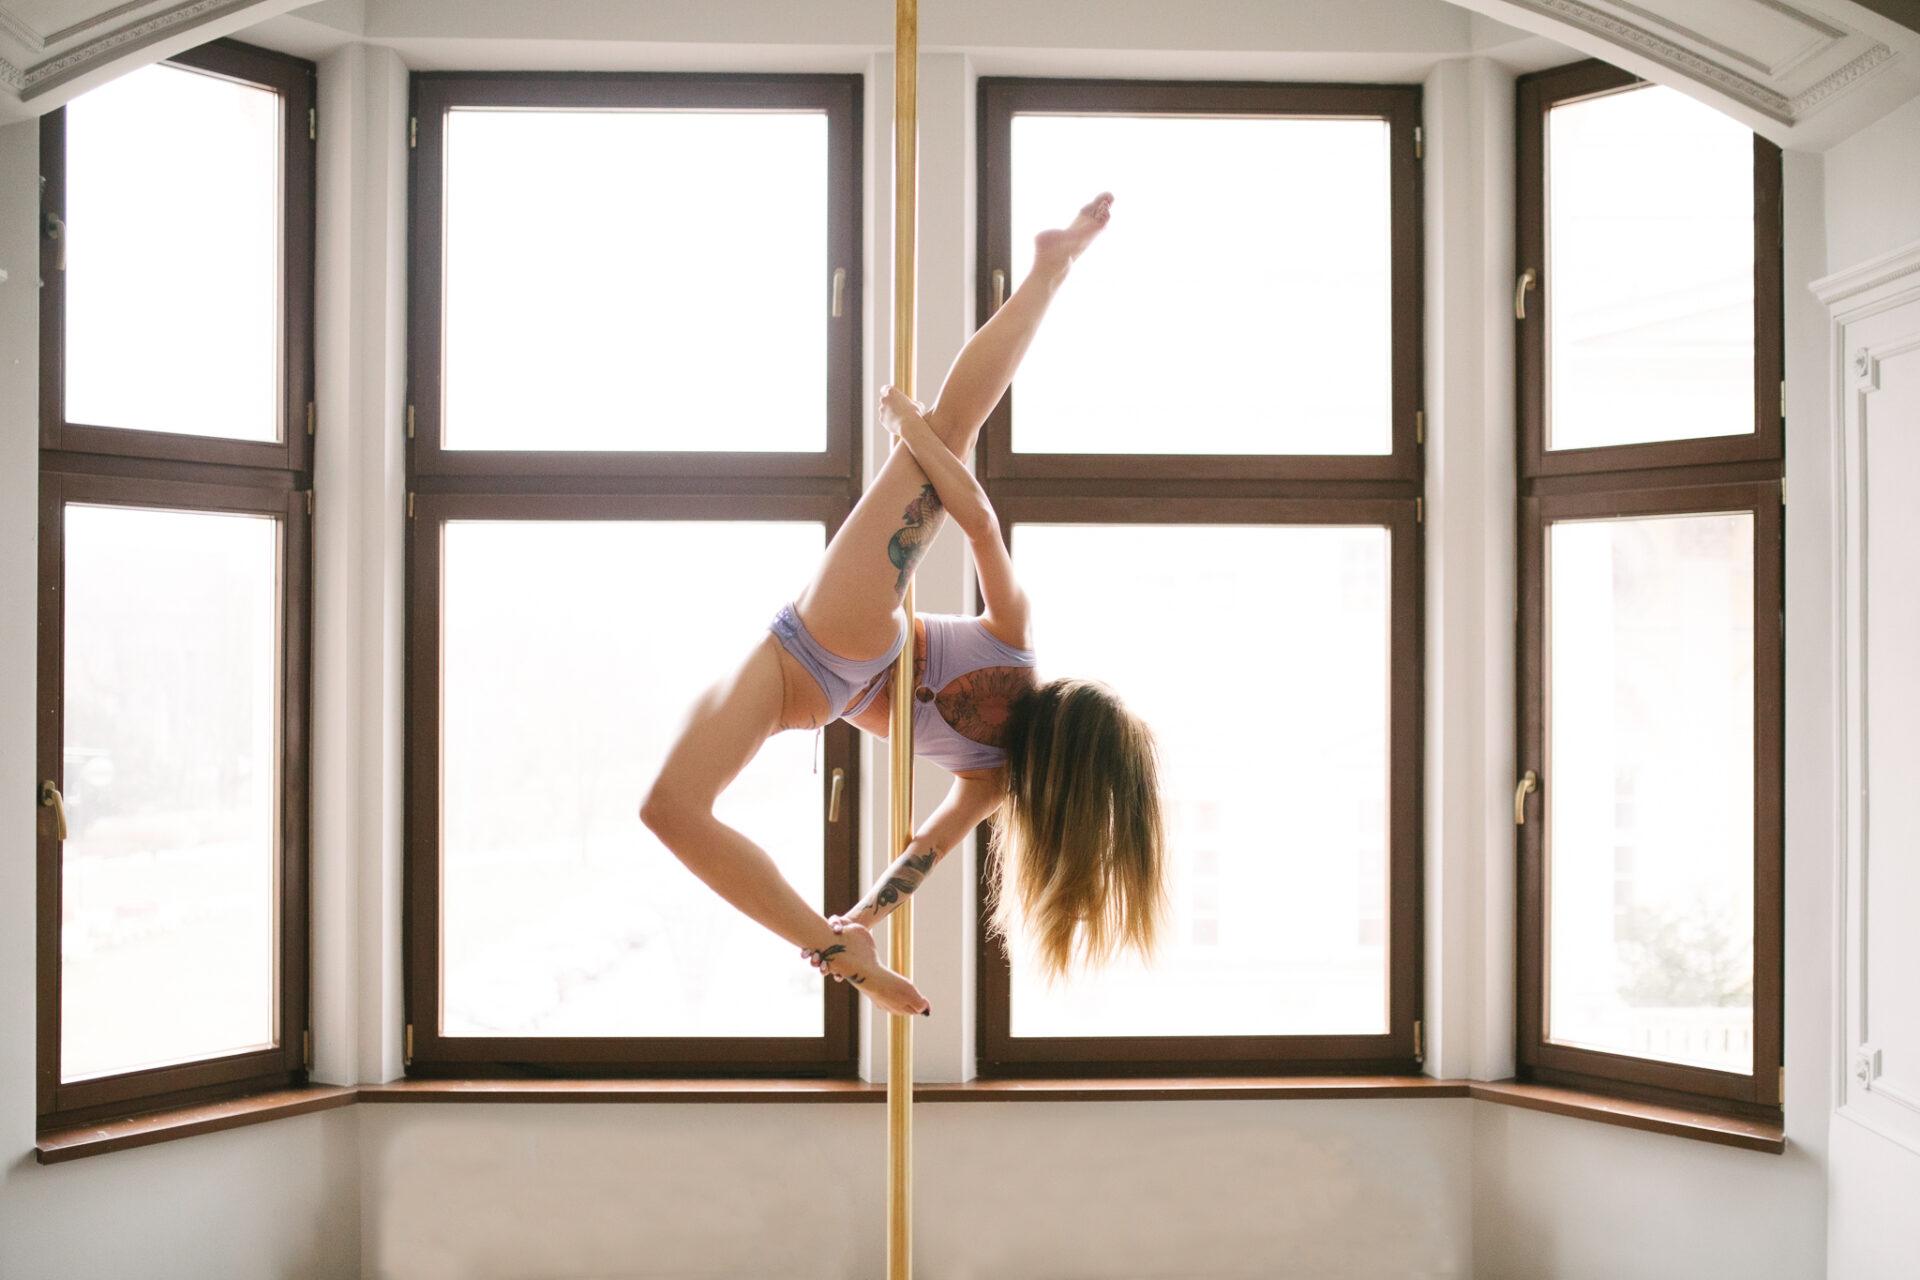 figury-na-sesje-pole-dance-allegra-szpagat-pole-empire-wrocław